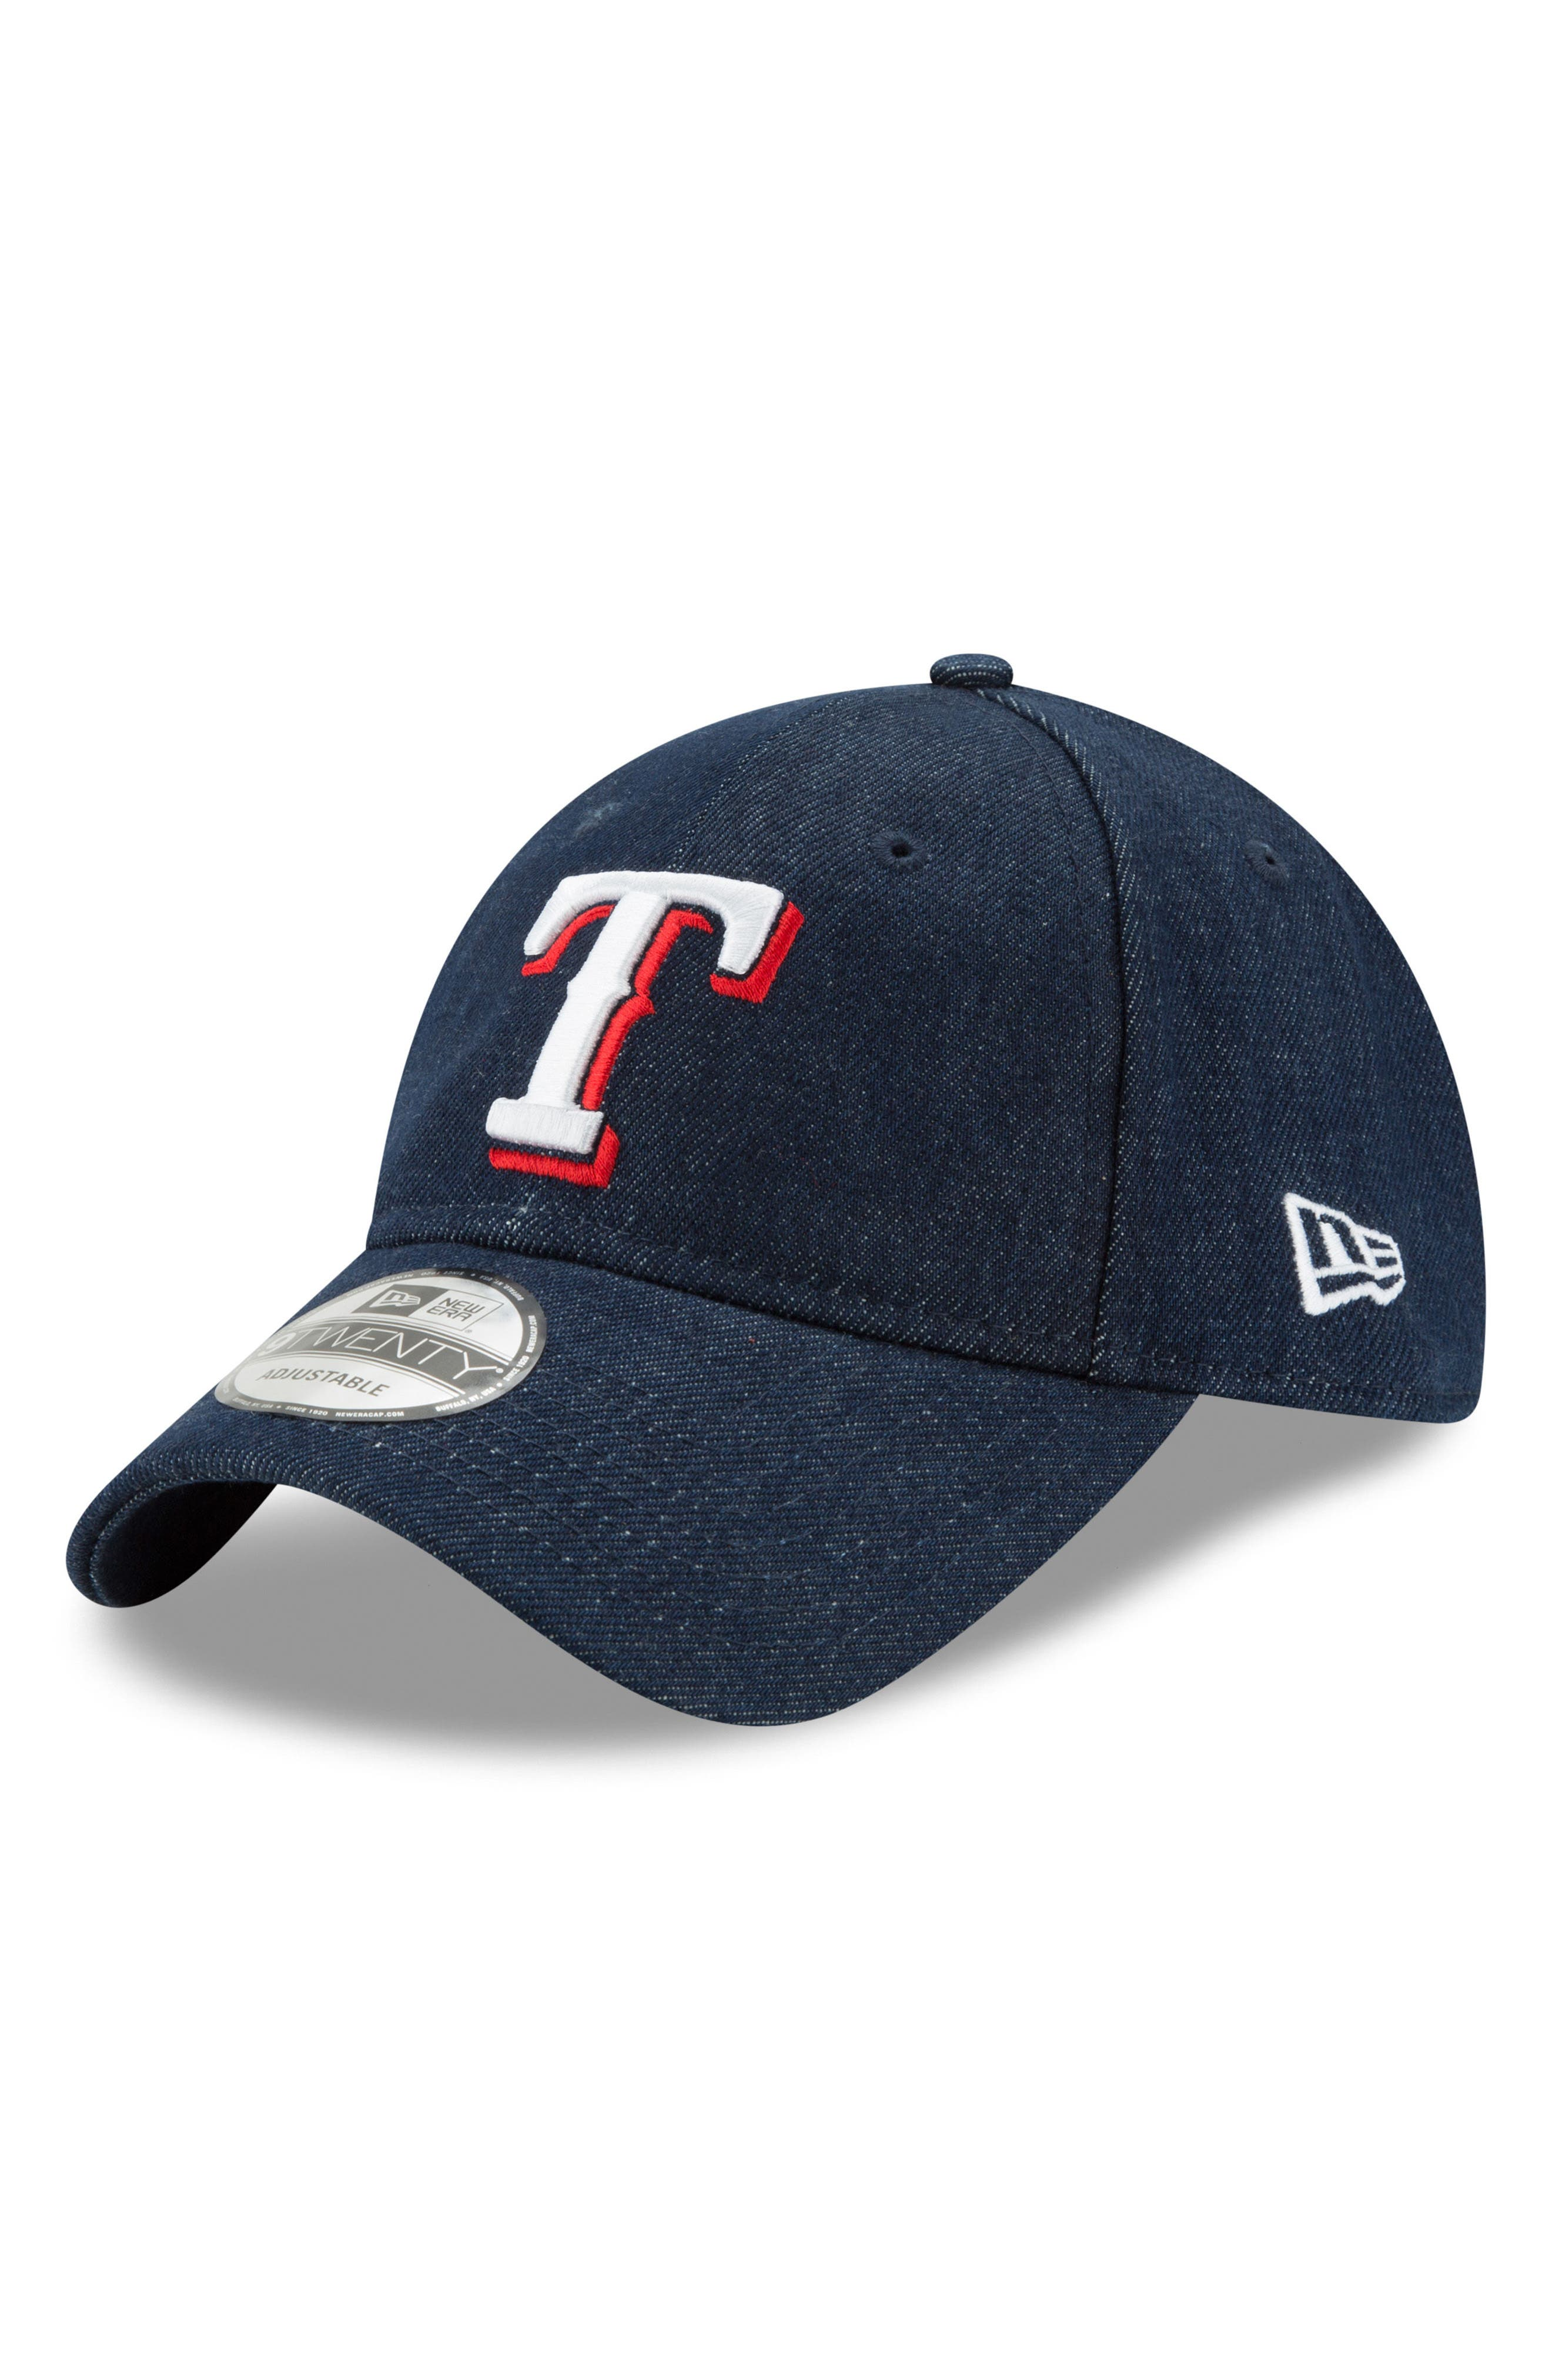 x Levi's<sup>®</sup> MLB17 Denim Baseball Cap,                         Main,                         color, 001